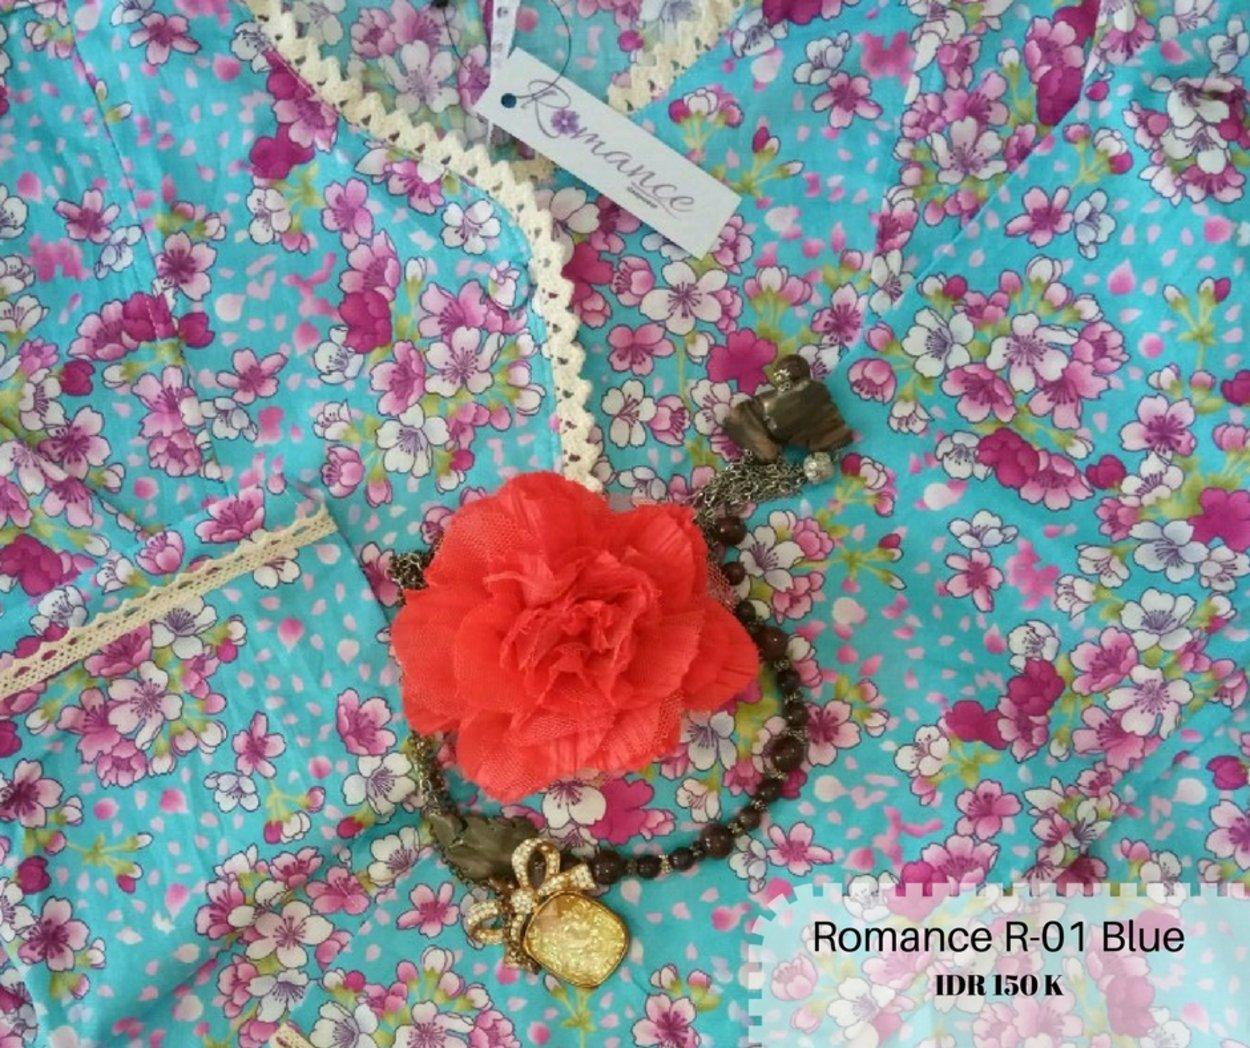 Romance biru